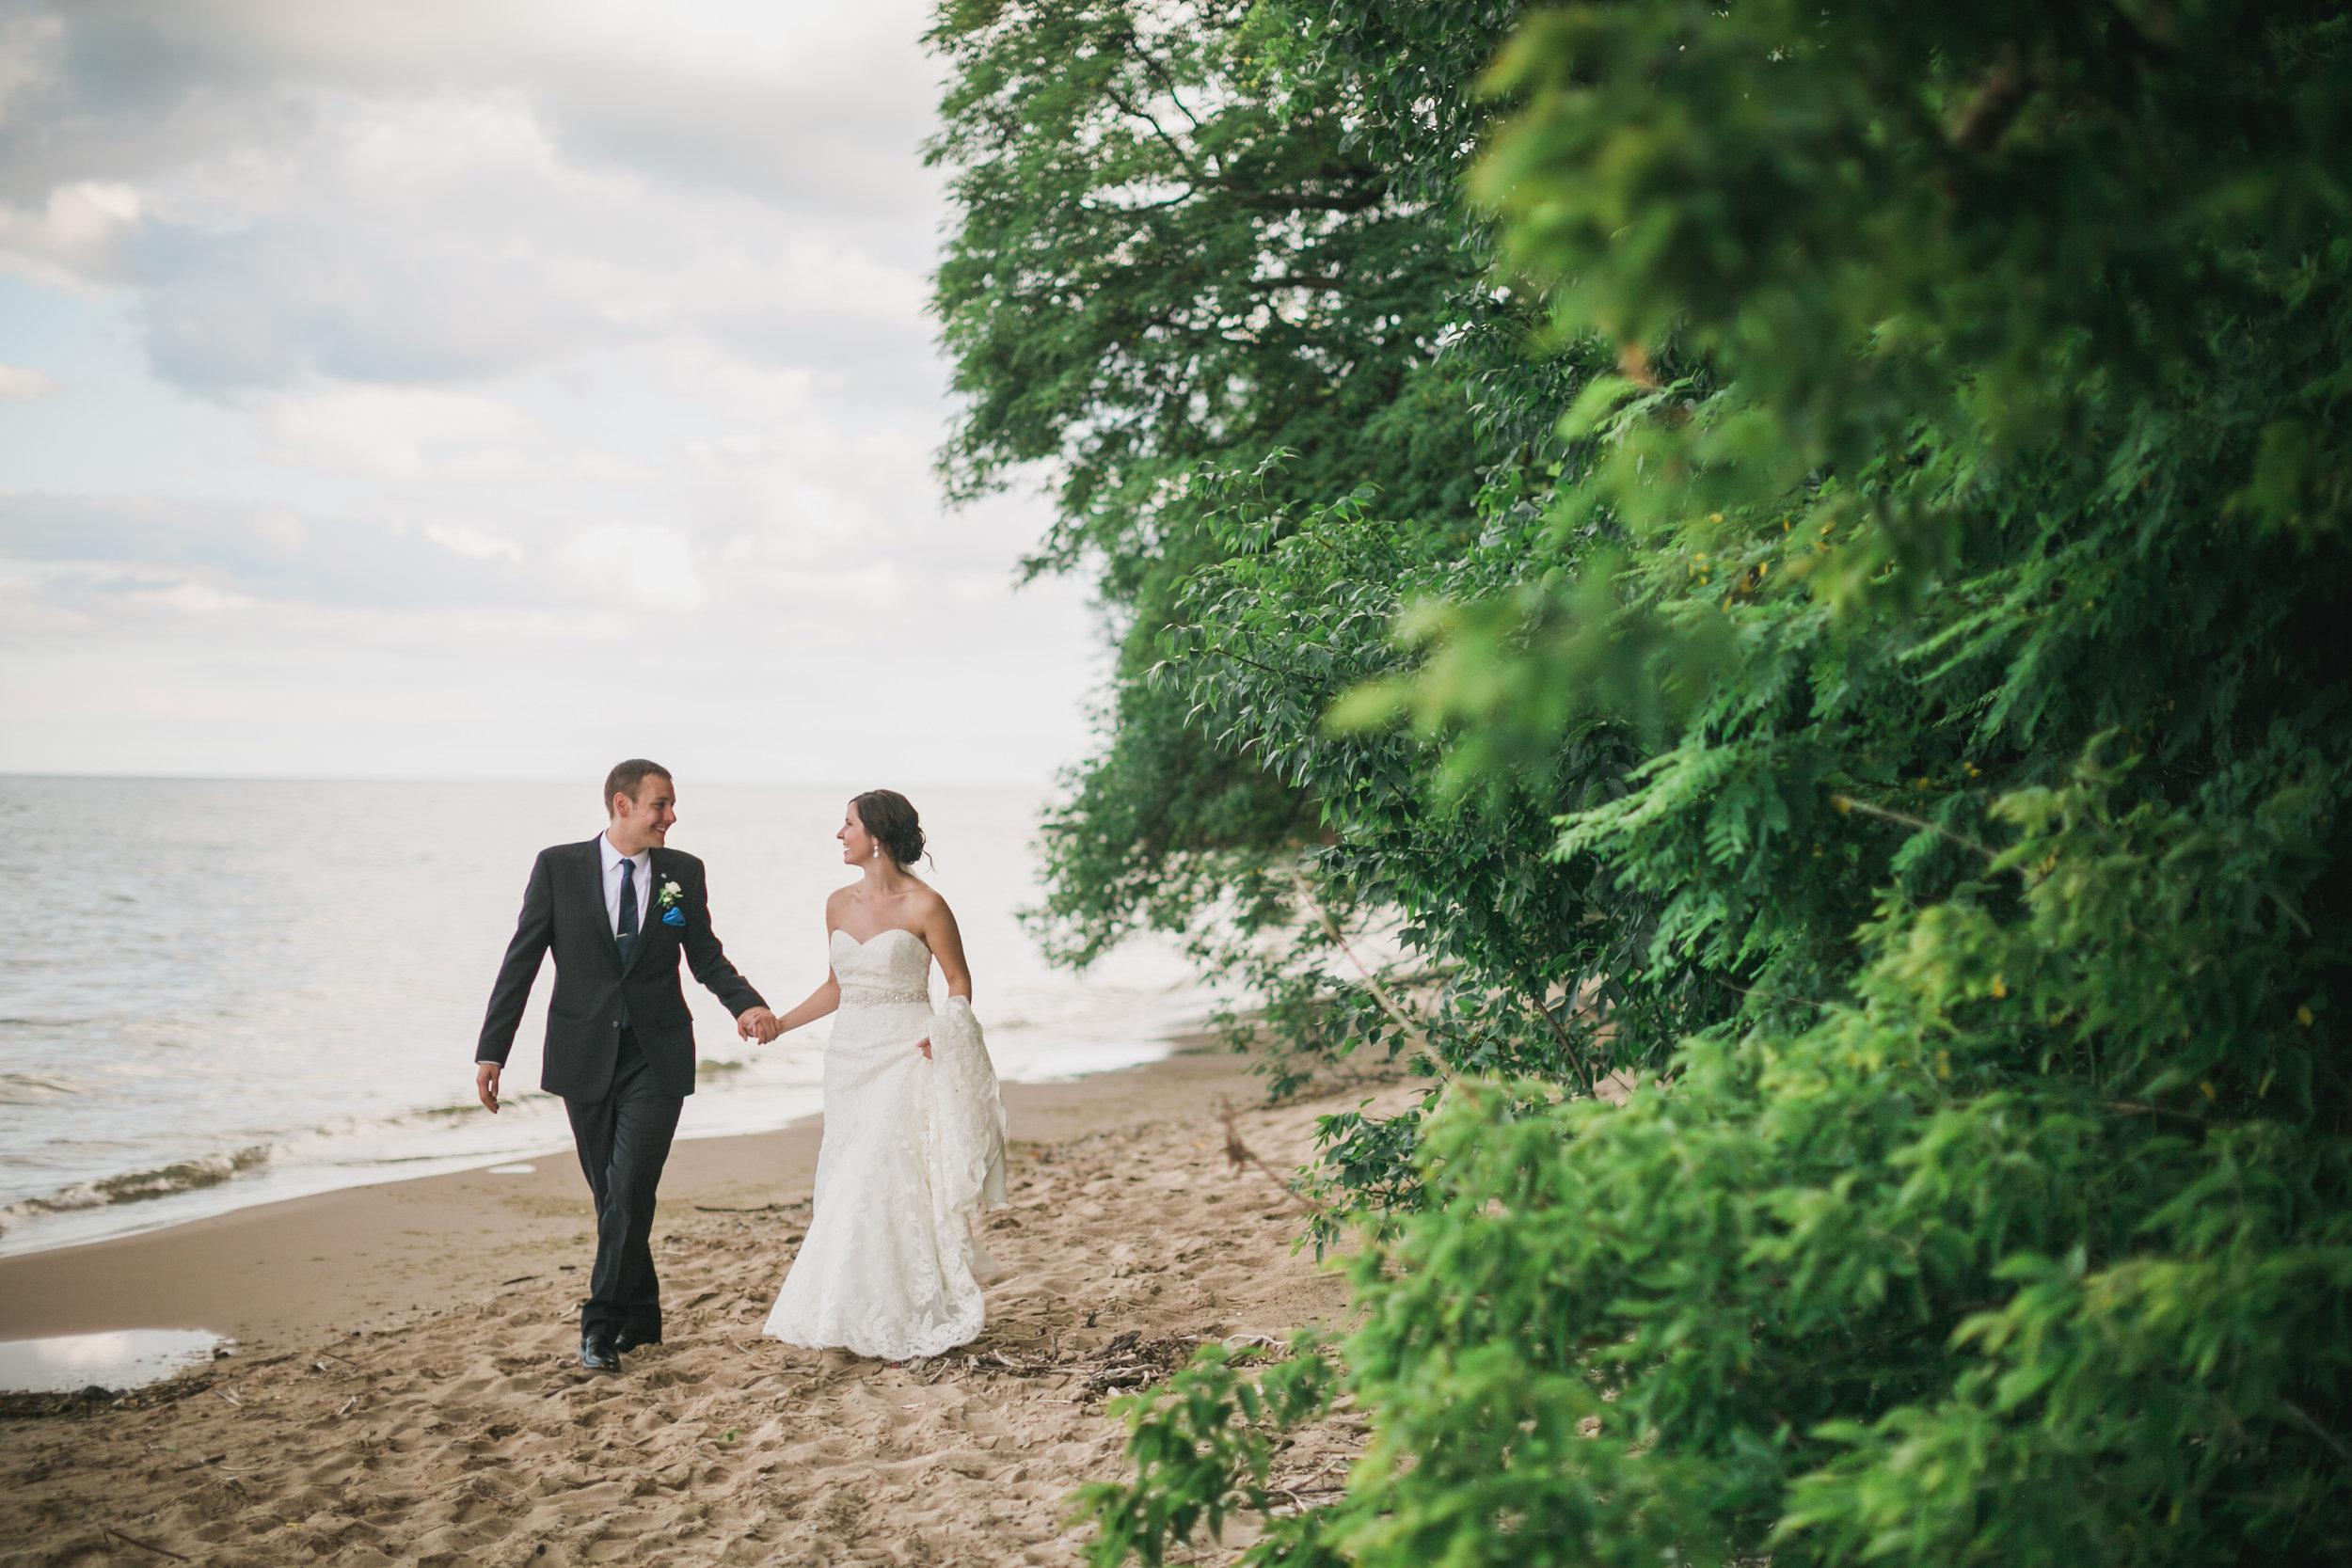 wisconsin-wedding-acowsay-uttke-photography-46.jpg